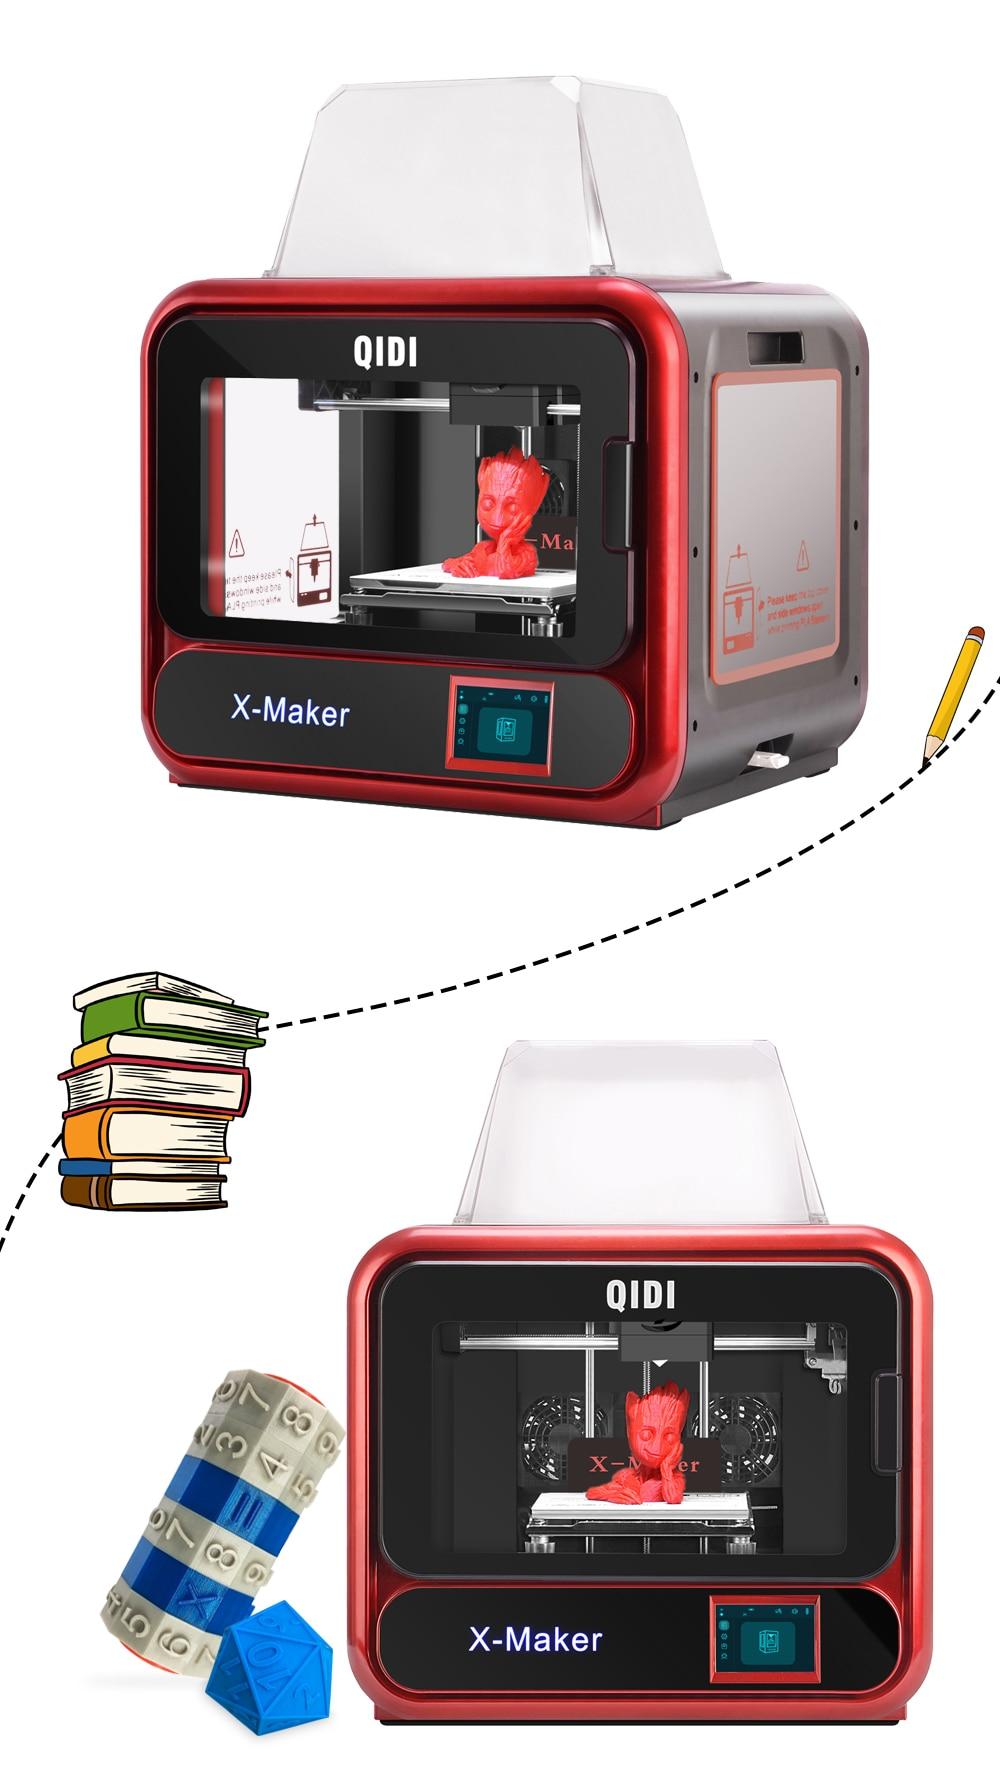 QIDI TECH X-Maker 3D Printer with Camera Wifi Touch Screen Single Nozzle Printing 8